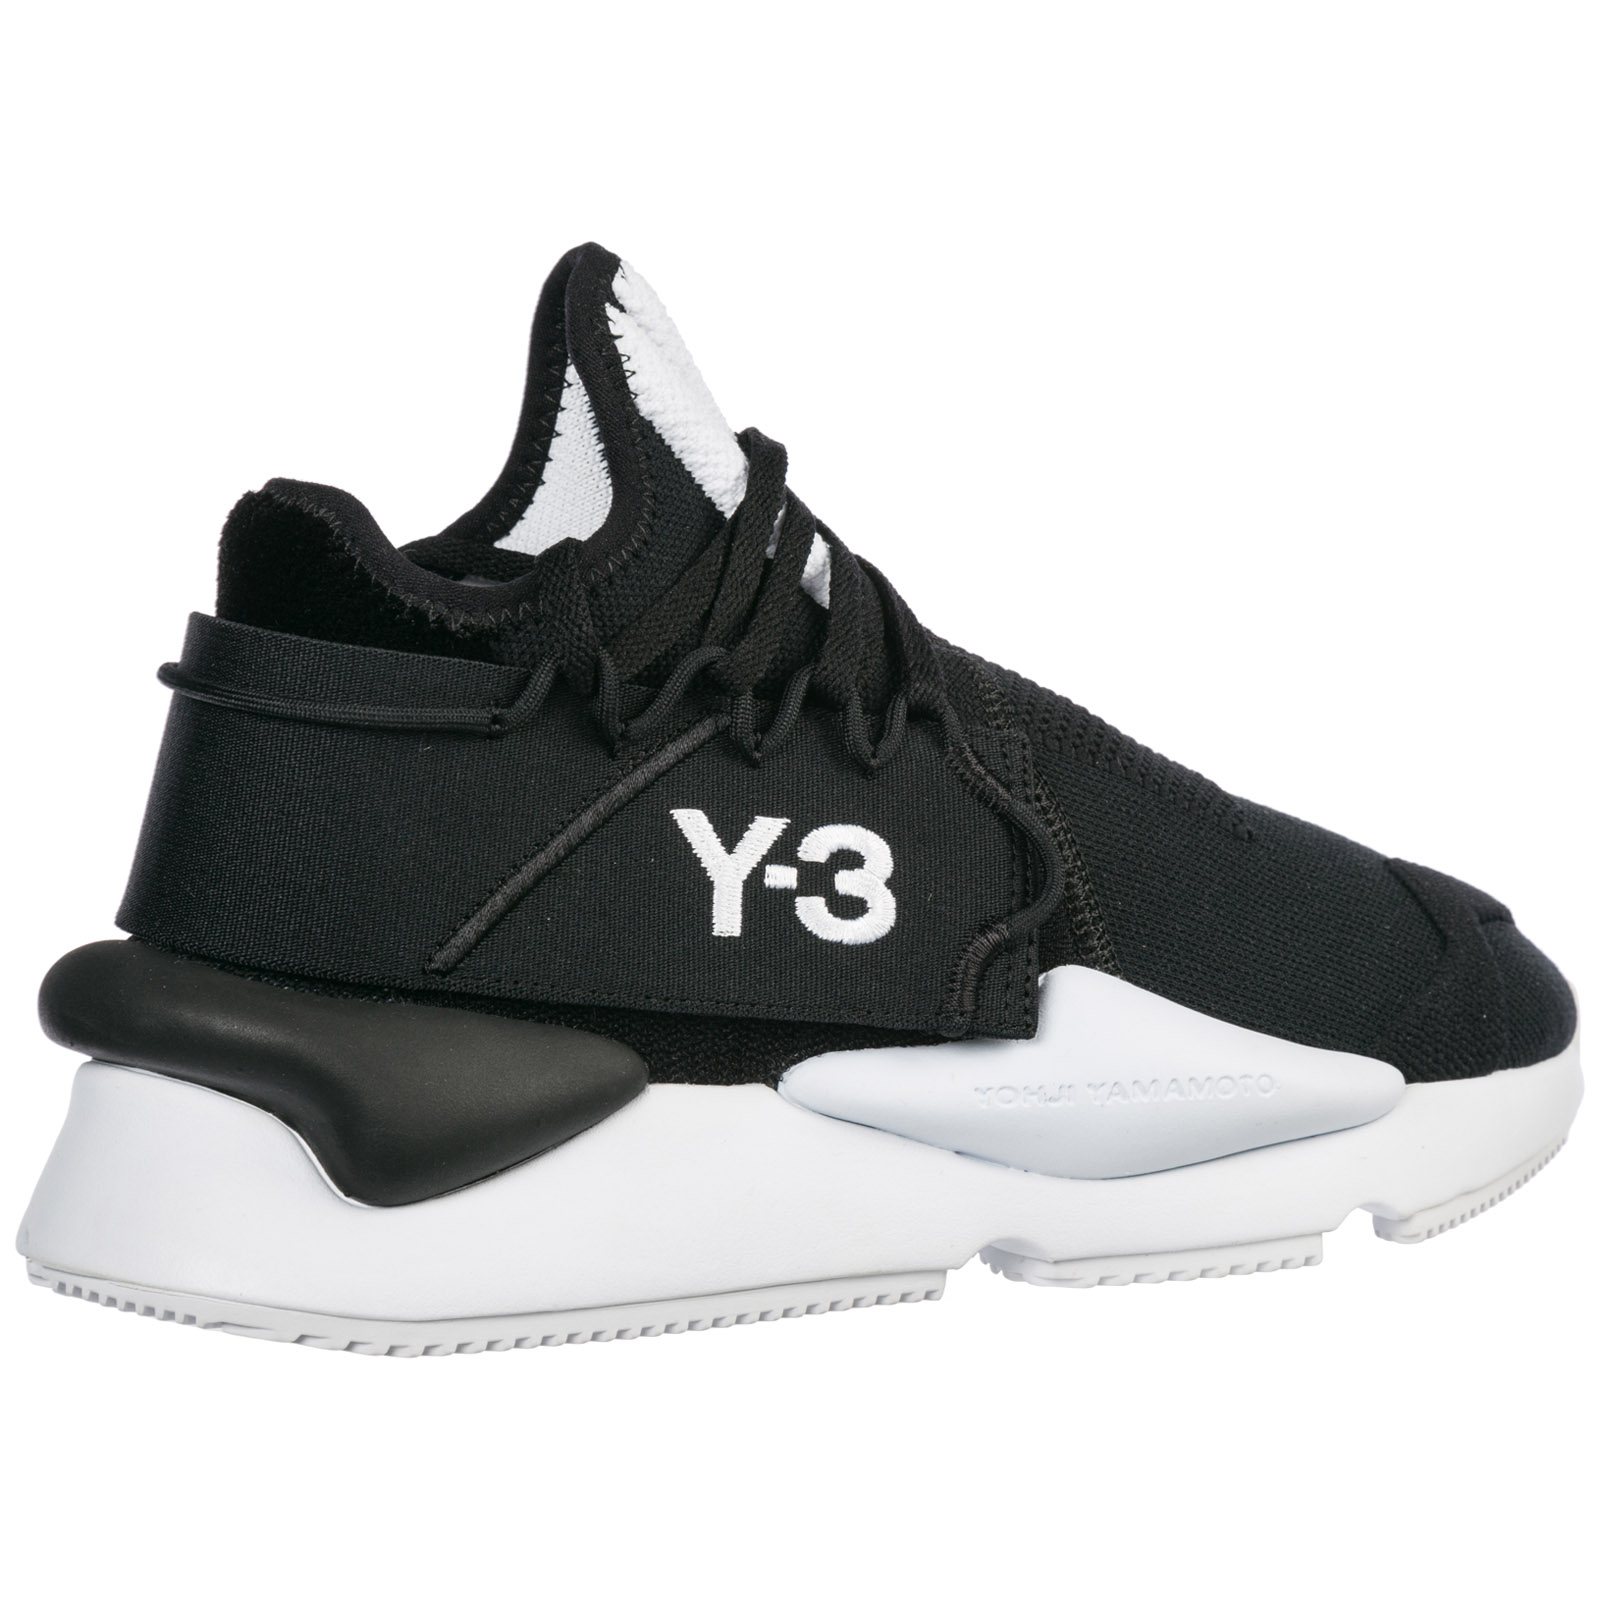 sale retailer 5580b e5faf ... Scarpe sneakers uomo kaiwa ...